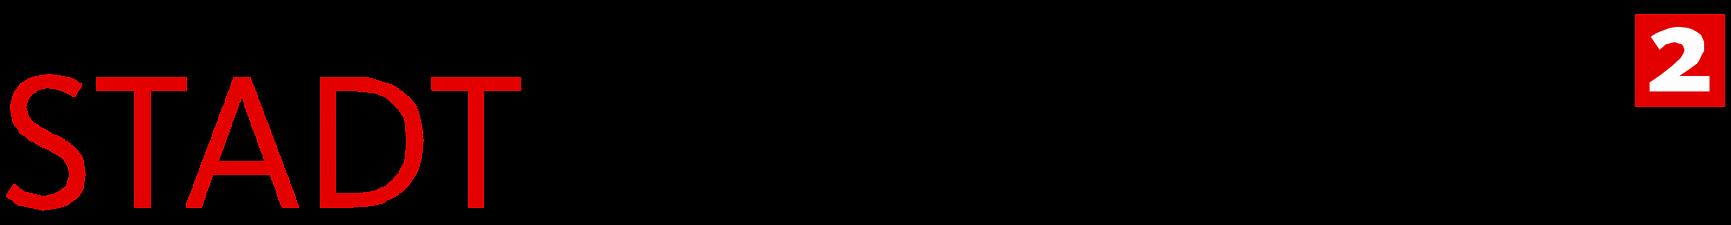 0x225-logo-0015f3eb686829f3.png (1731×225)